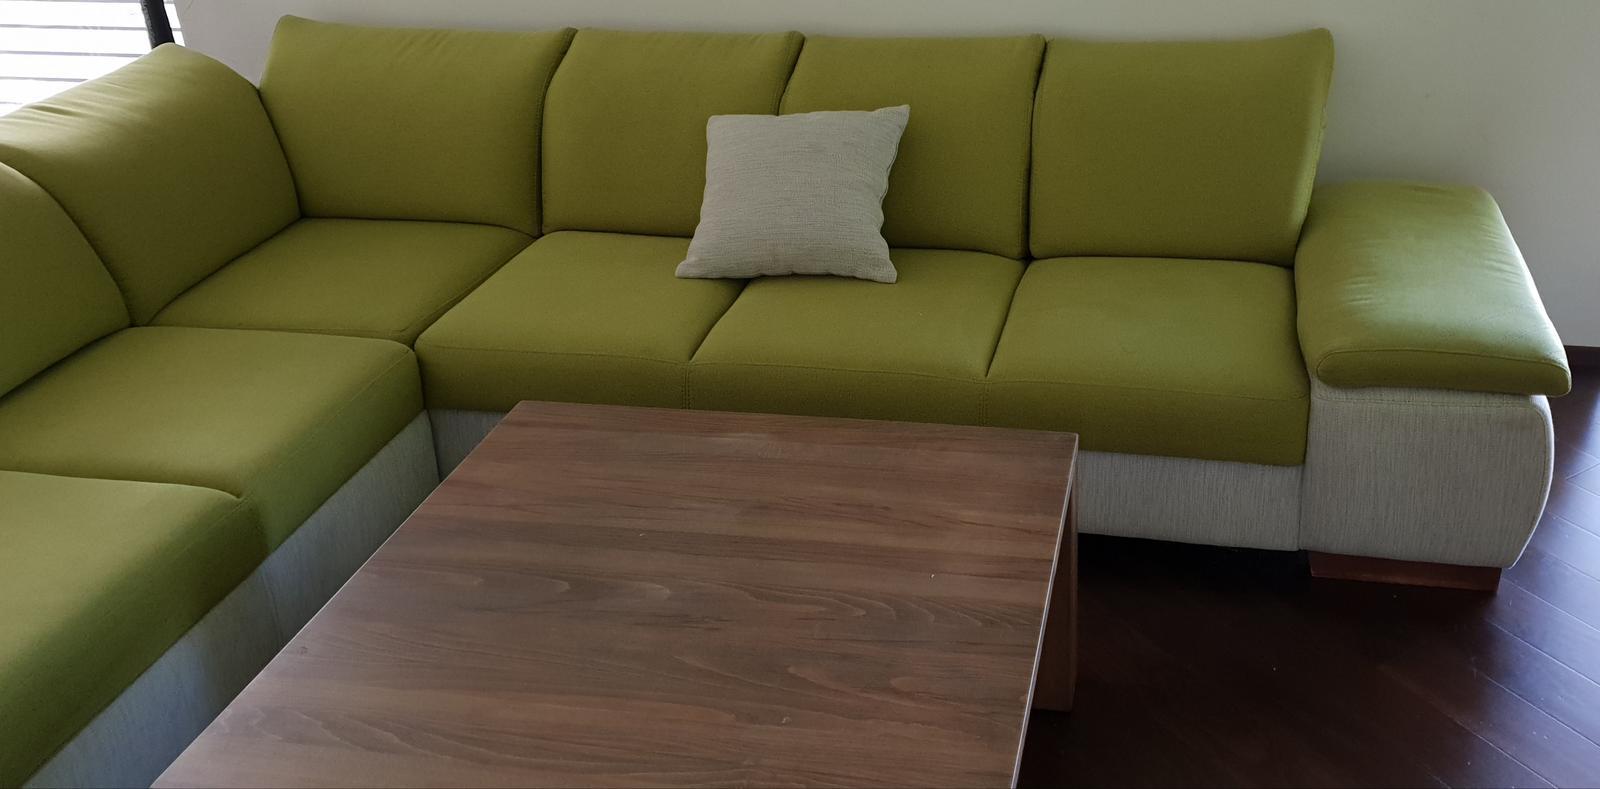 rozkladacia sedacka Milenium sipos - Obrázok č. 4